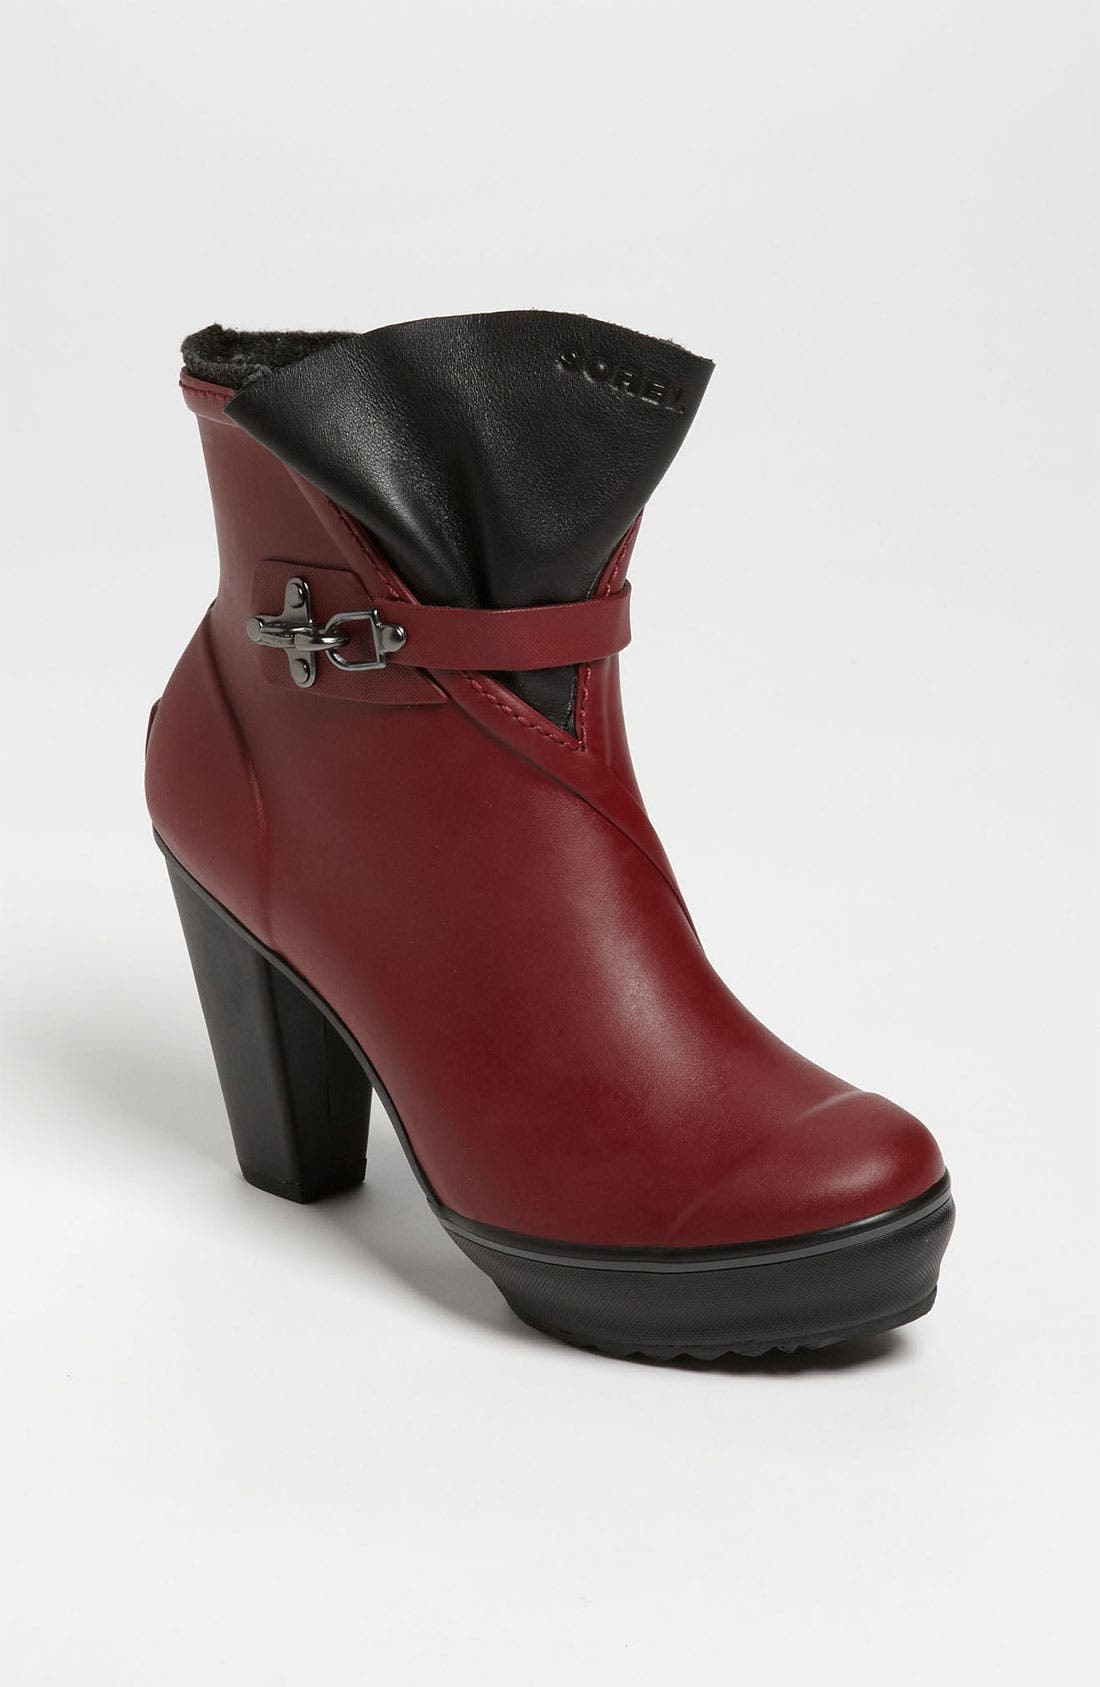 Alternate Image 1 Selected - SOREL 'Medina' Rain Boot (Women)